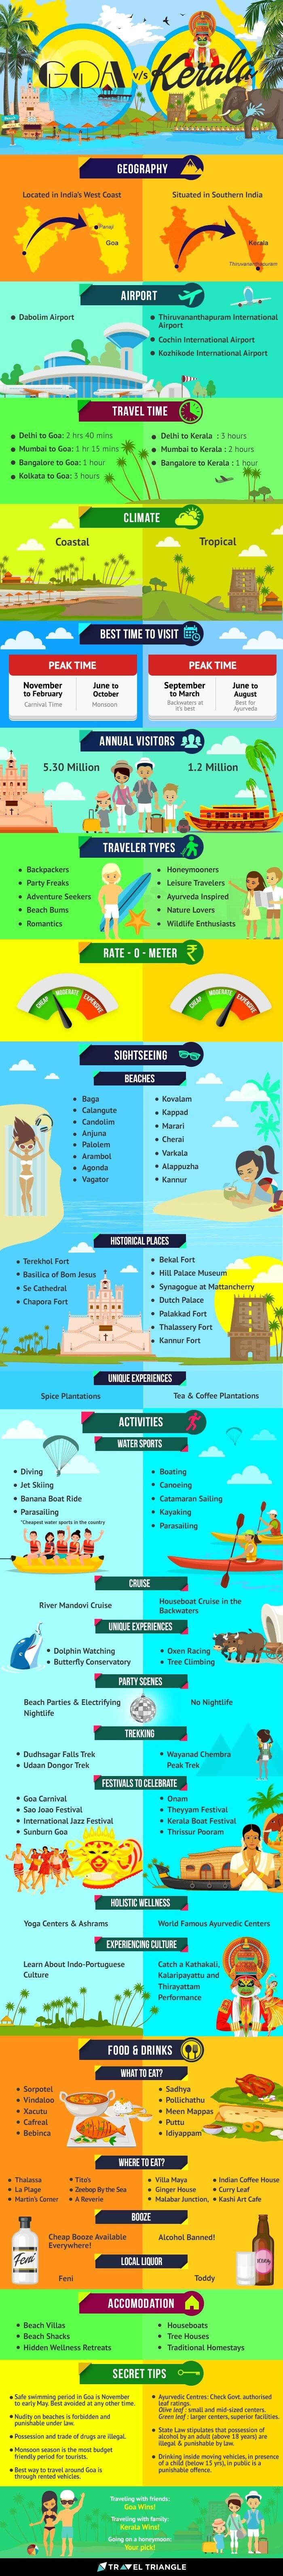 goa vs kerala infographic